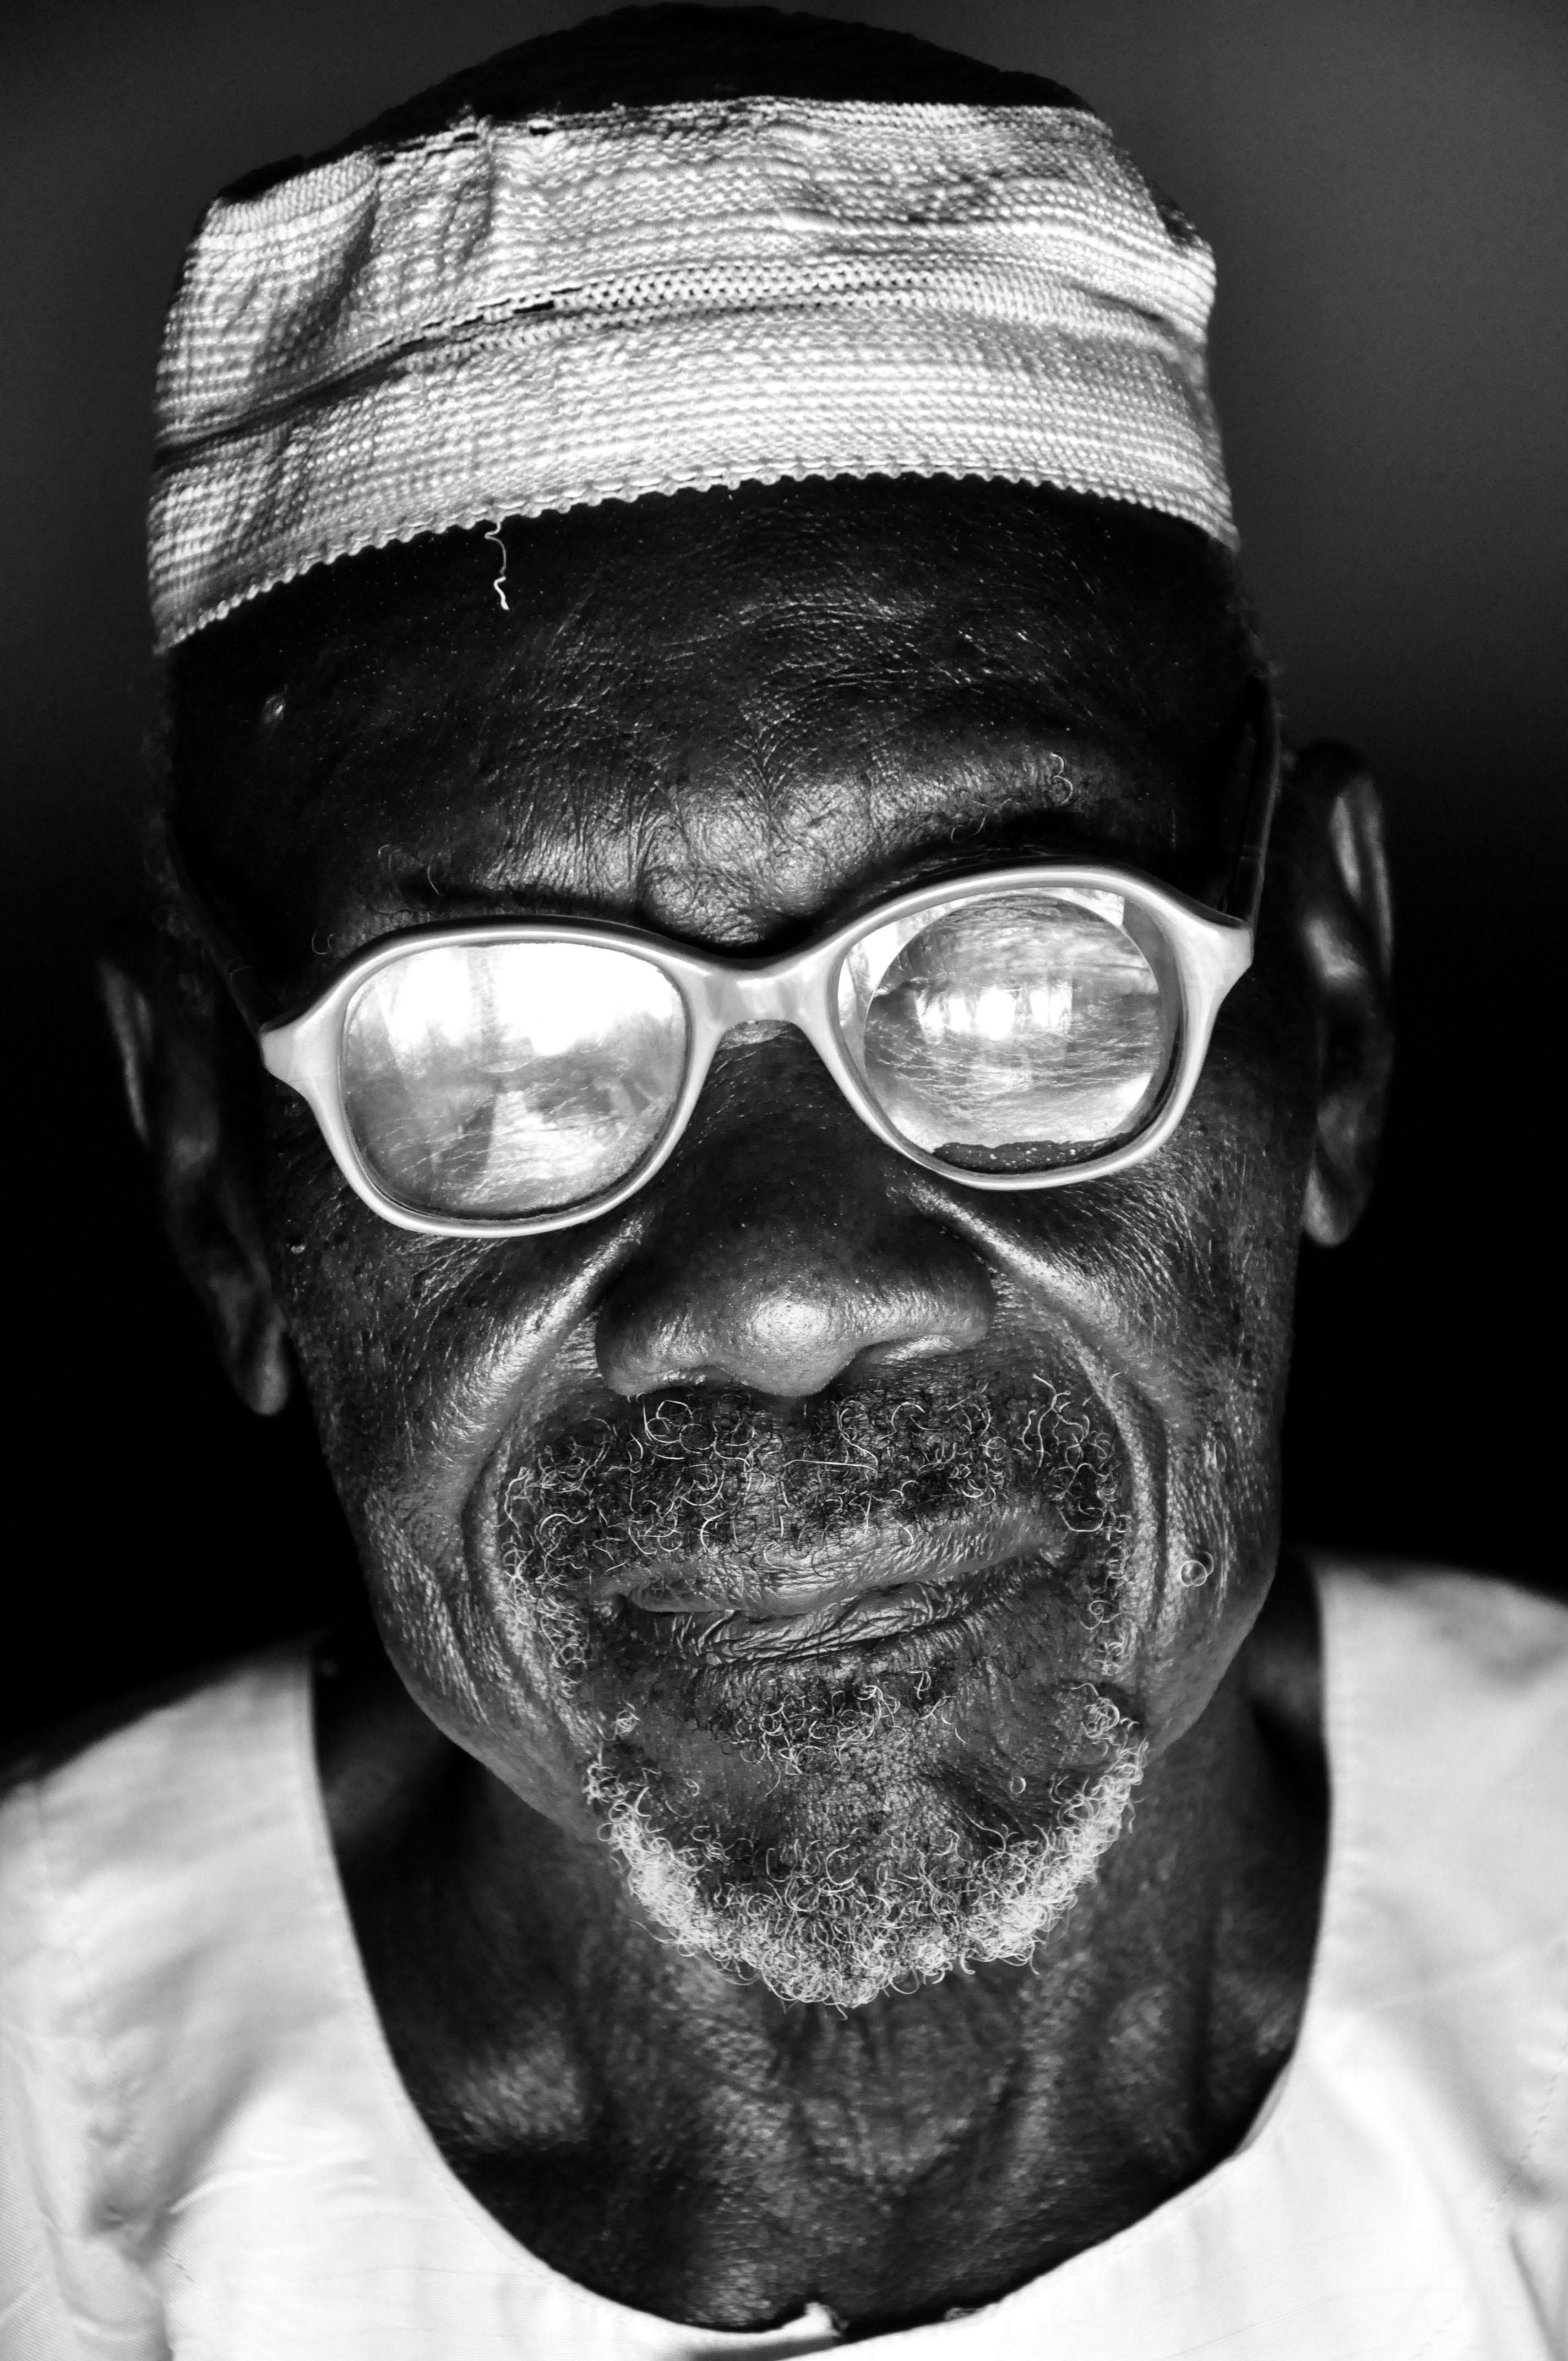 Profile Image - Ibrahim Mohamed